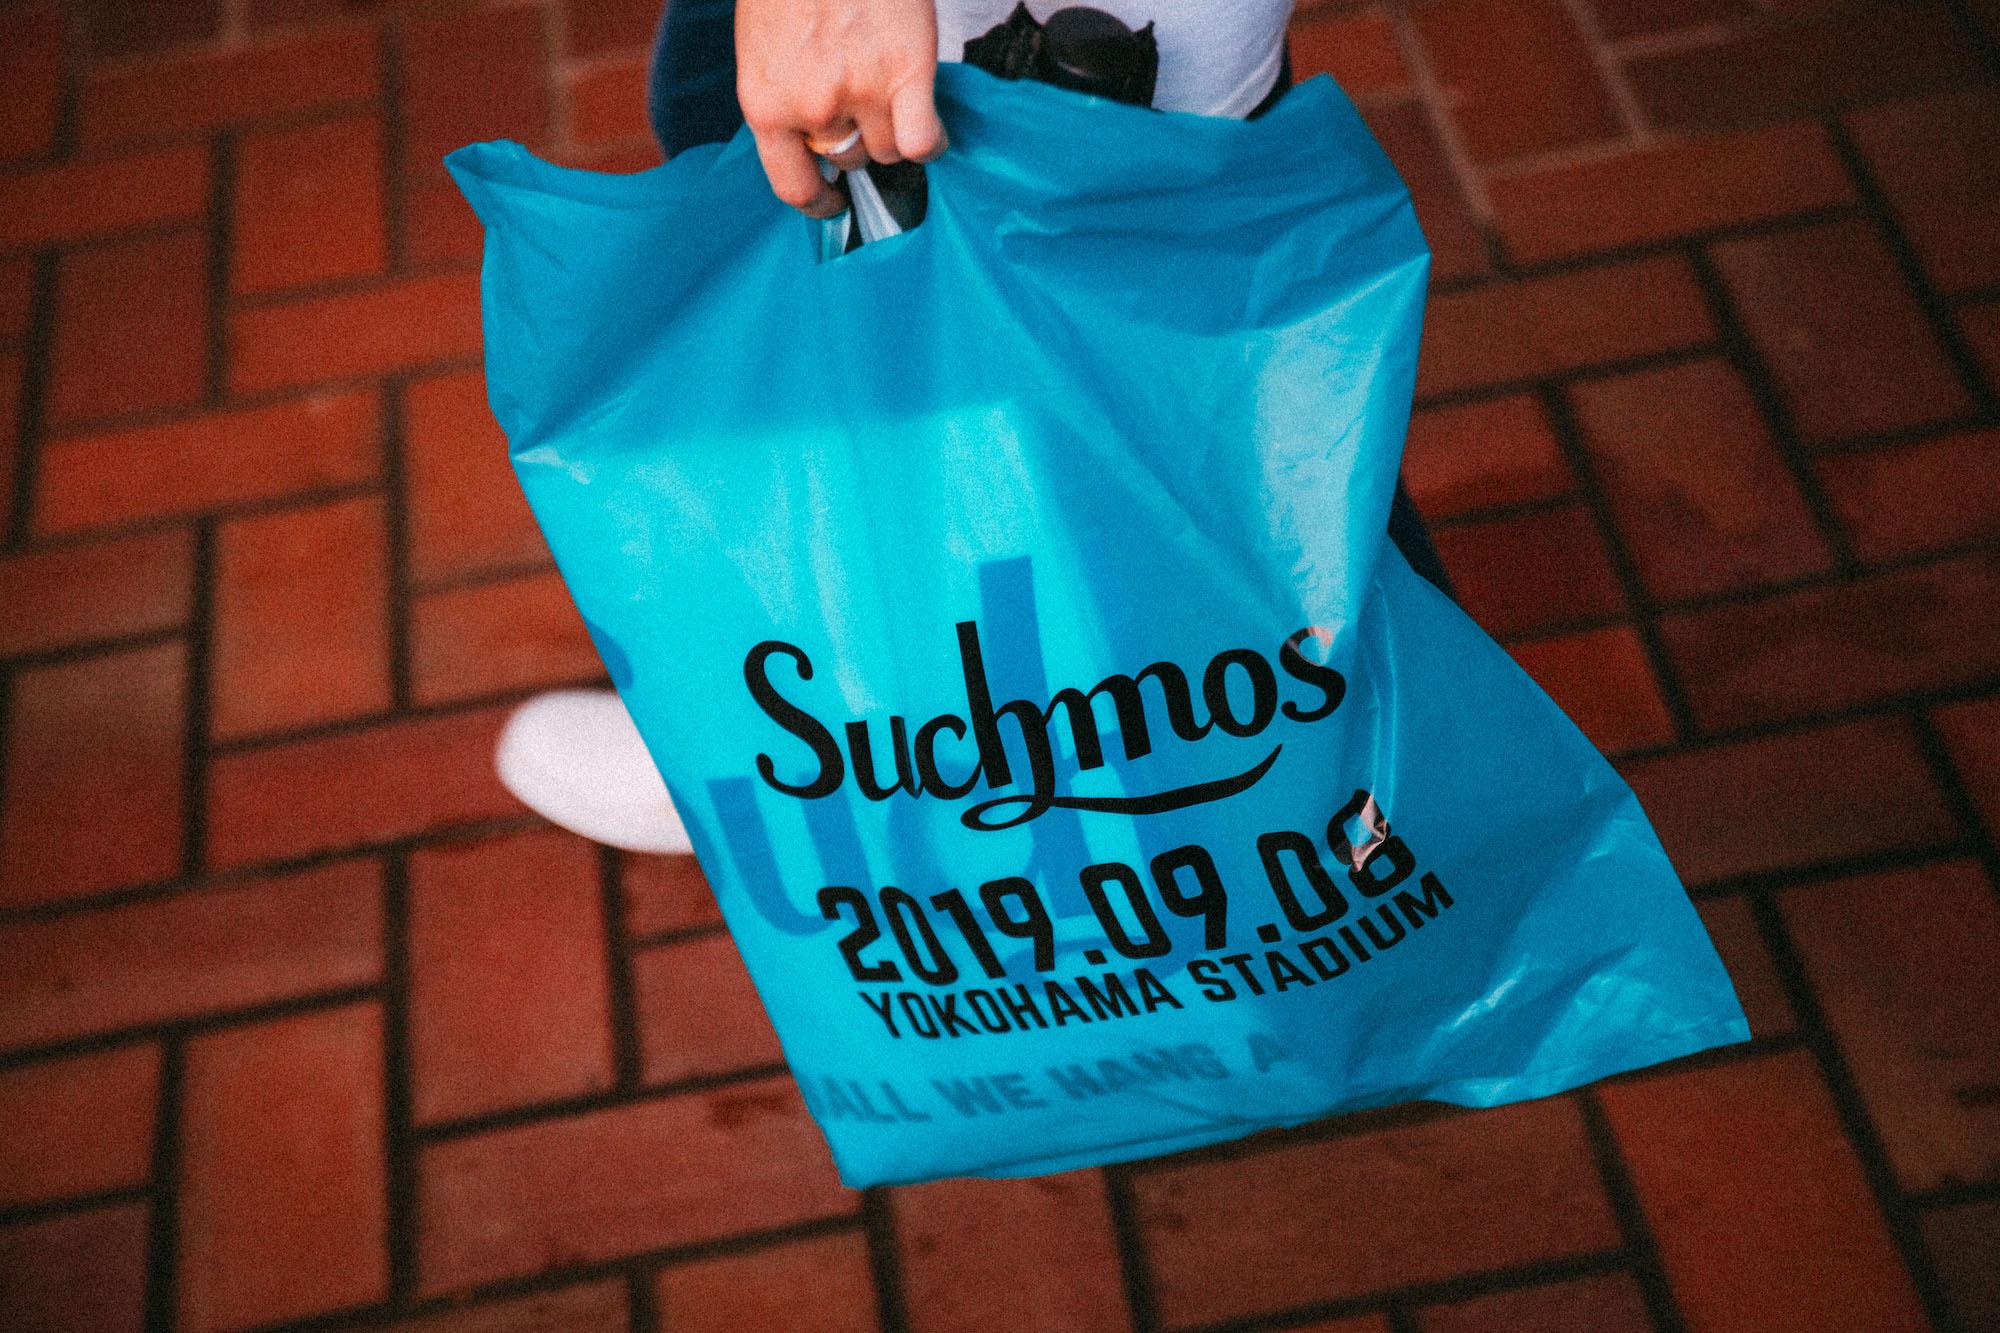 【Photo Documentary】Suchmos THE LIVE 横浜スタジアム report0920_suchmos_6